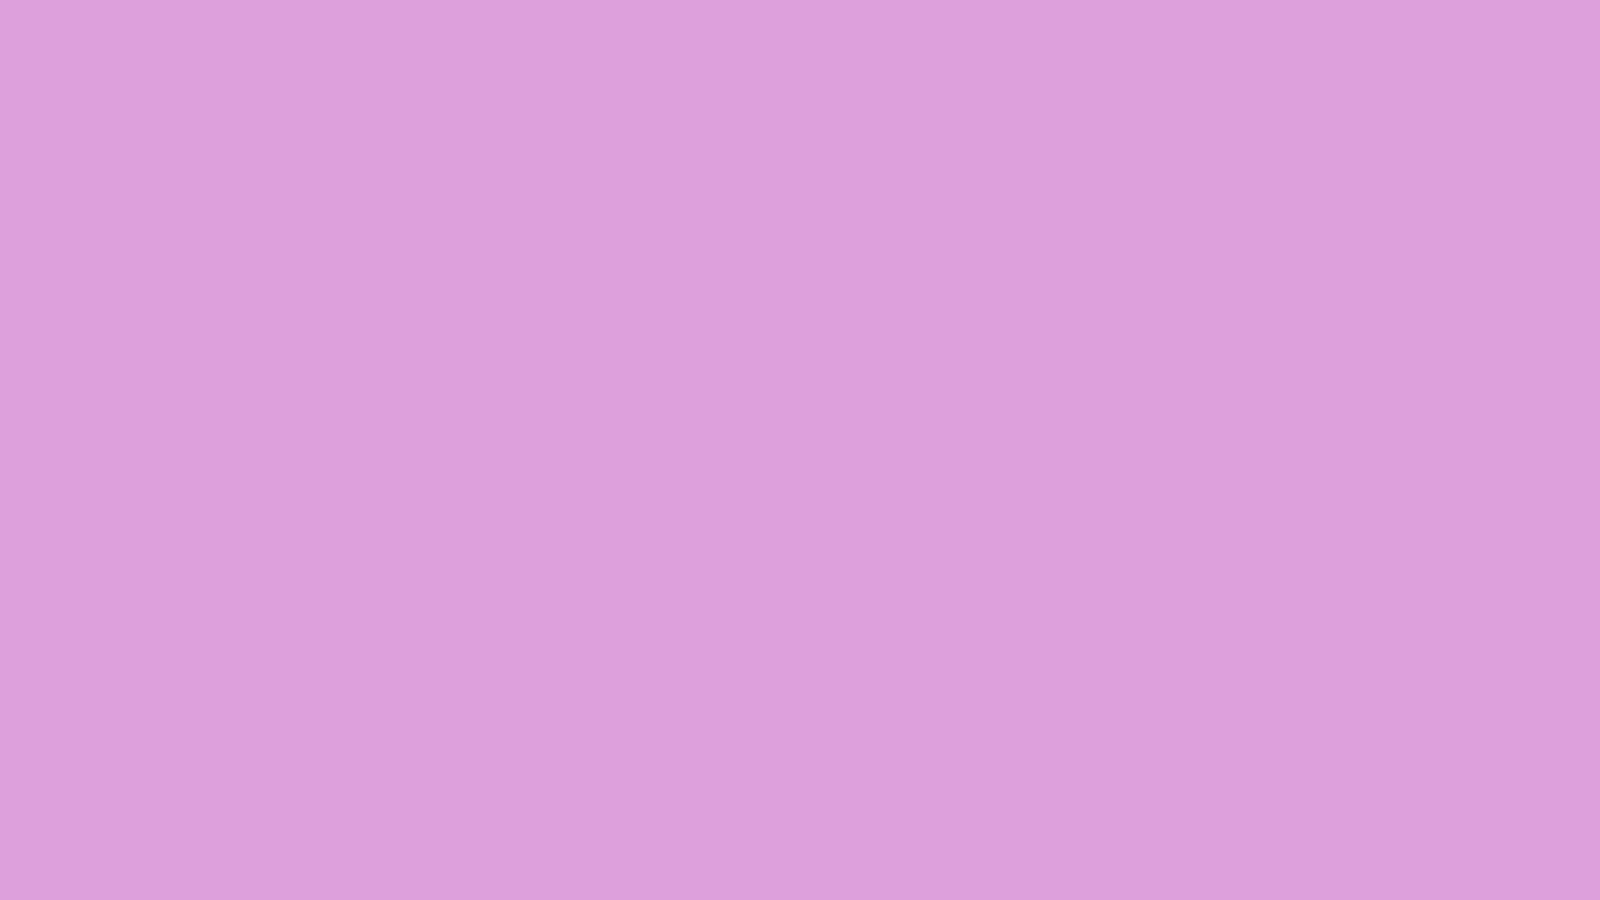 1600x900 Plum Web Solid Color Background